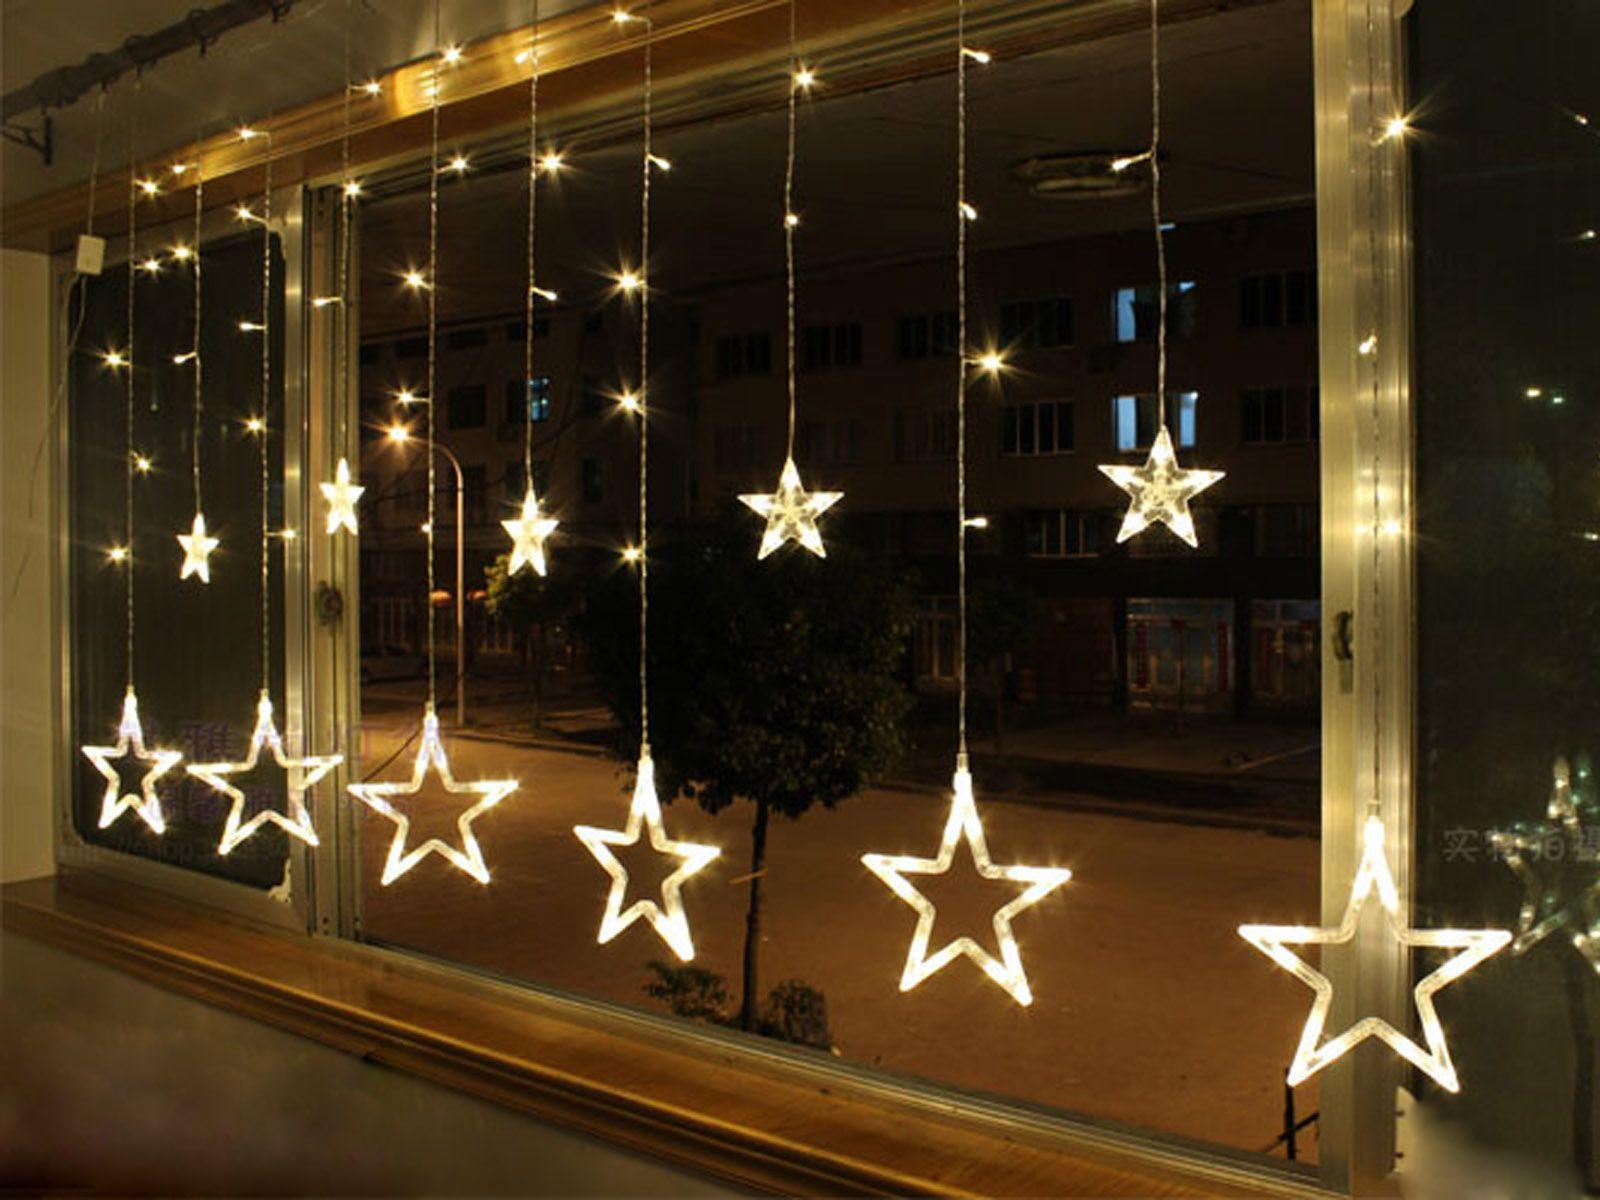 Hochzeit Im Freien Lichter Mieten Farbwechsel Christmas Lights Outdoor Beleuchtun Weihnachtsdeko Fenster Beleuchtung Weihnachten Fensterbeleuchtung Weihnachten